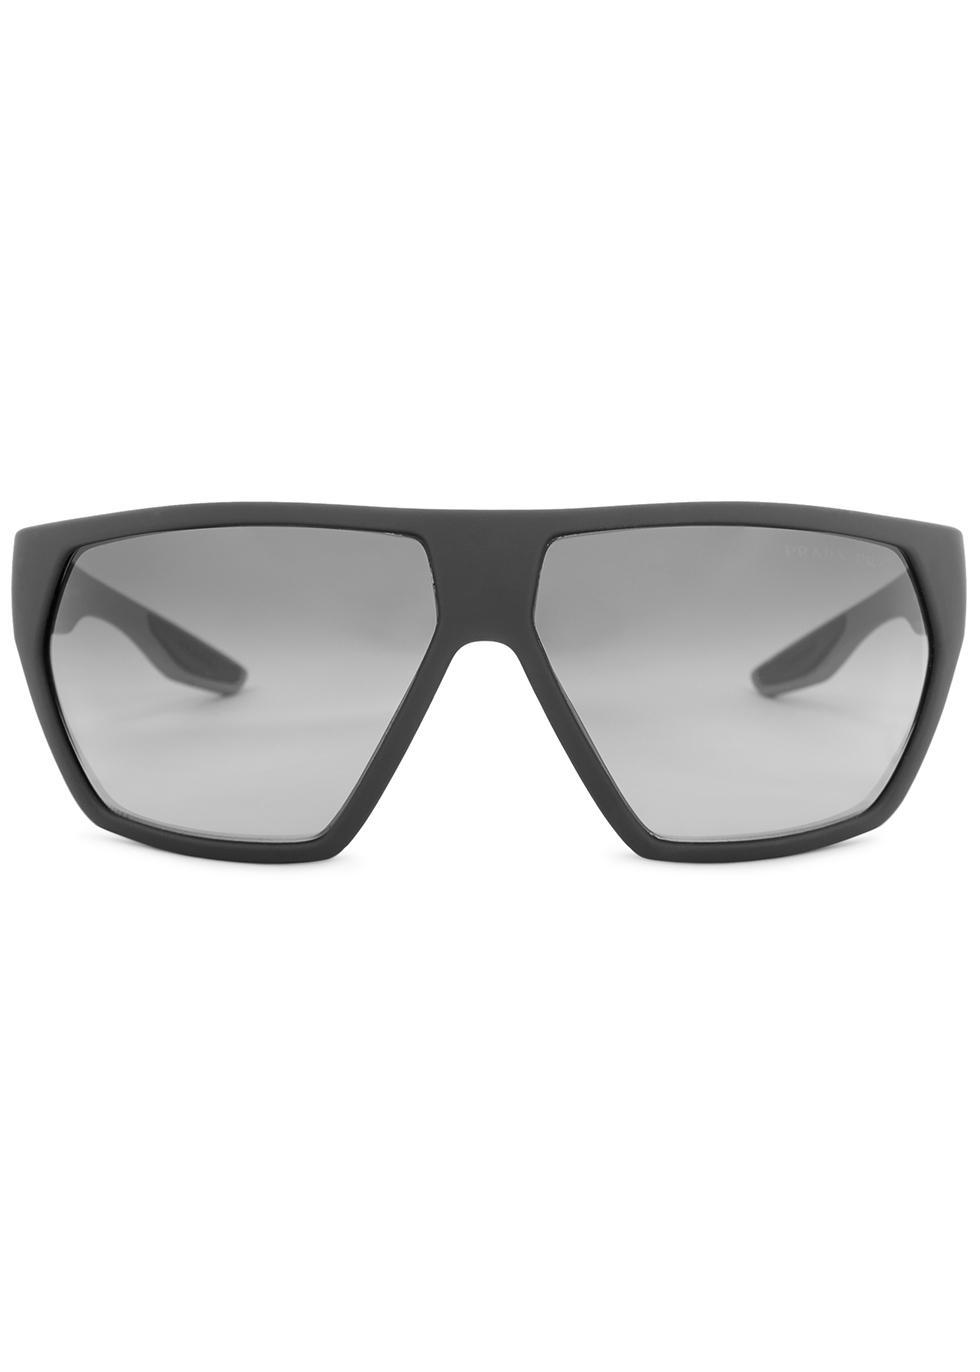 Black matte geometric frame sunglasses - Prada Linea Rossa